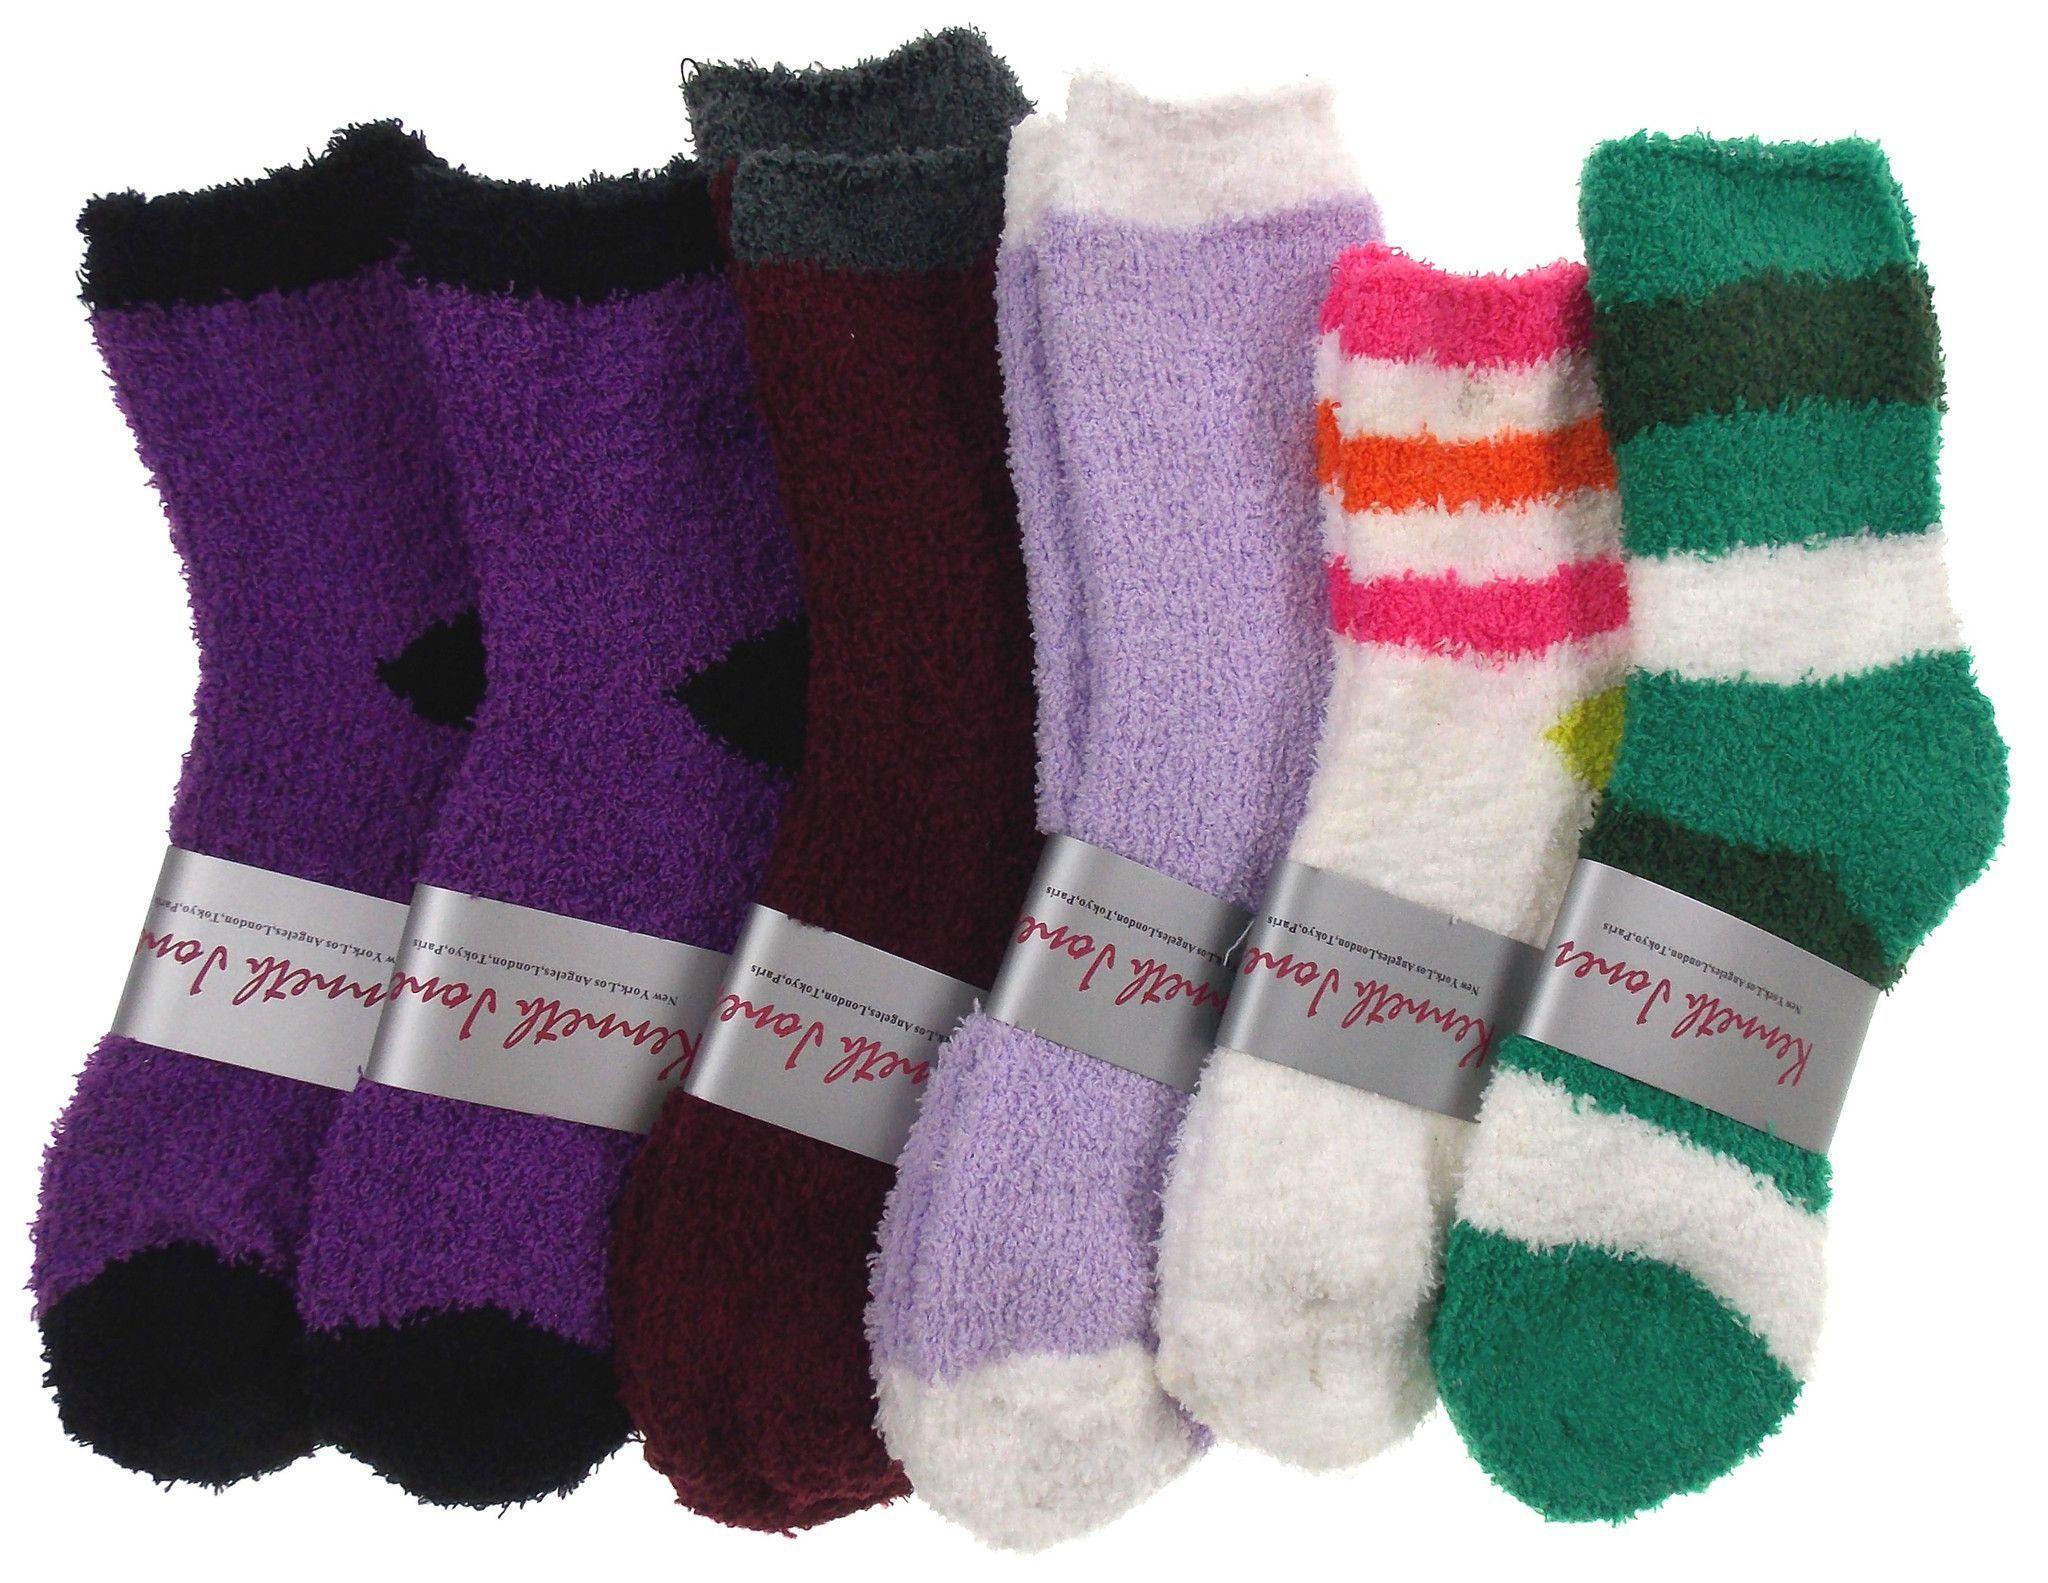 Lot of 6 Pairs Cozy Socks 4-10 Women Crew Kenneth Jones Fuzzy Warm Black Green